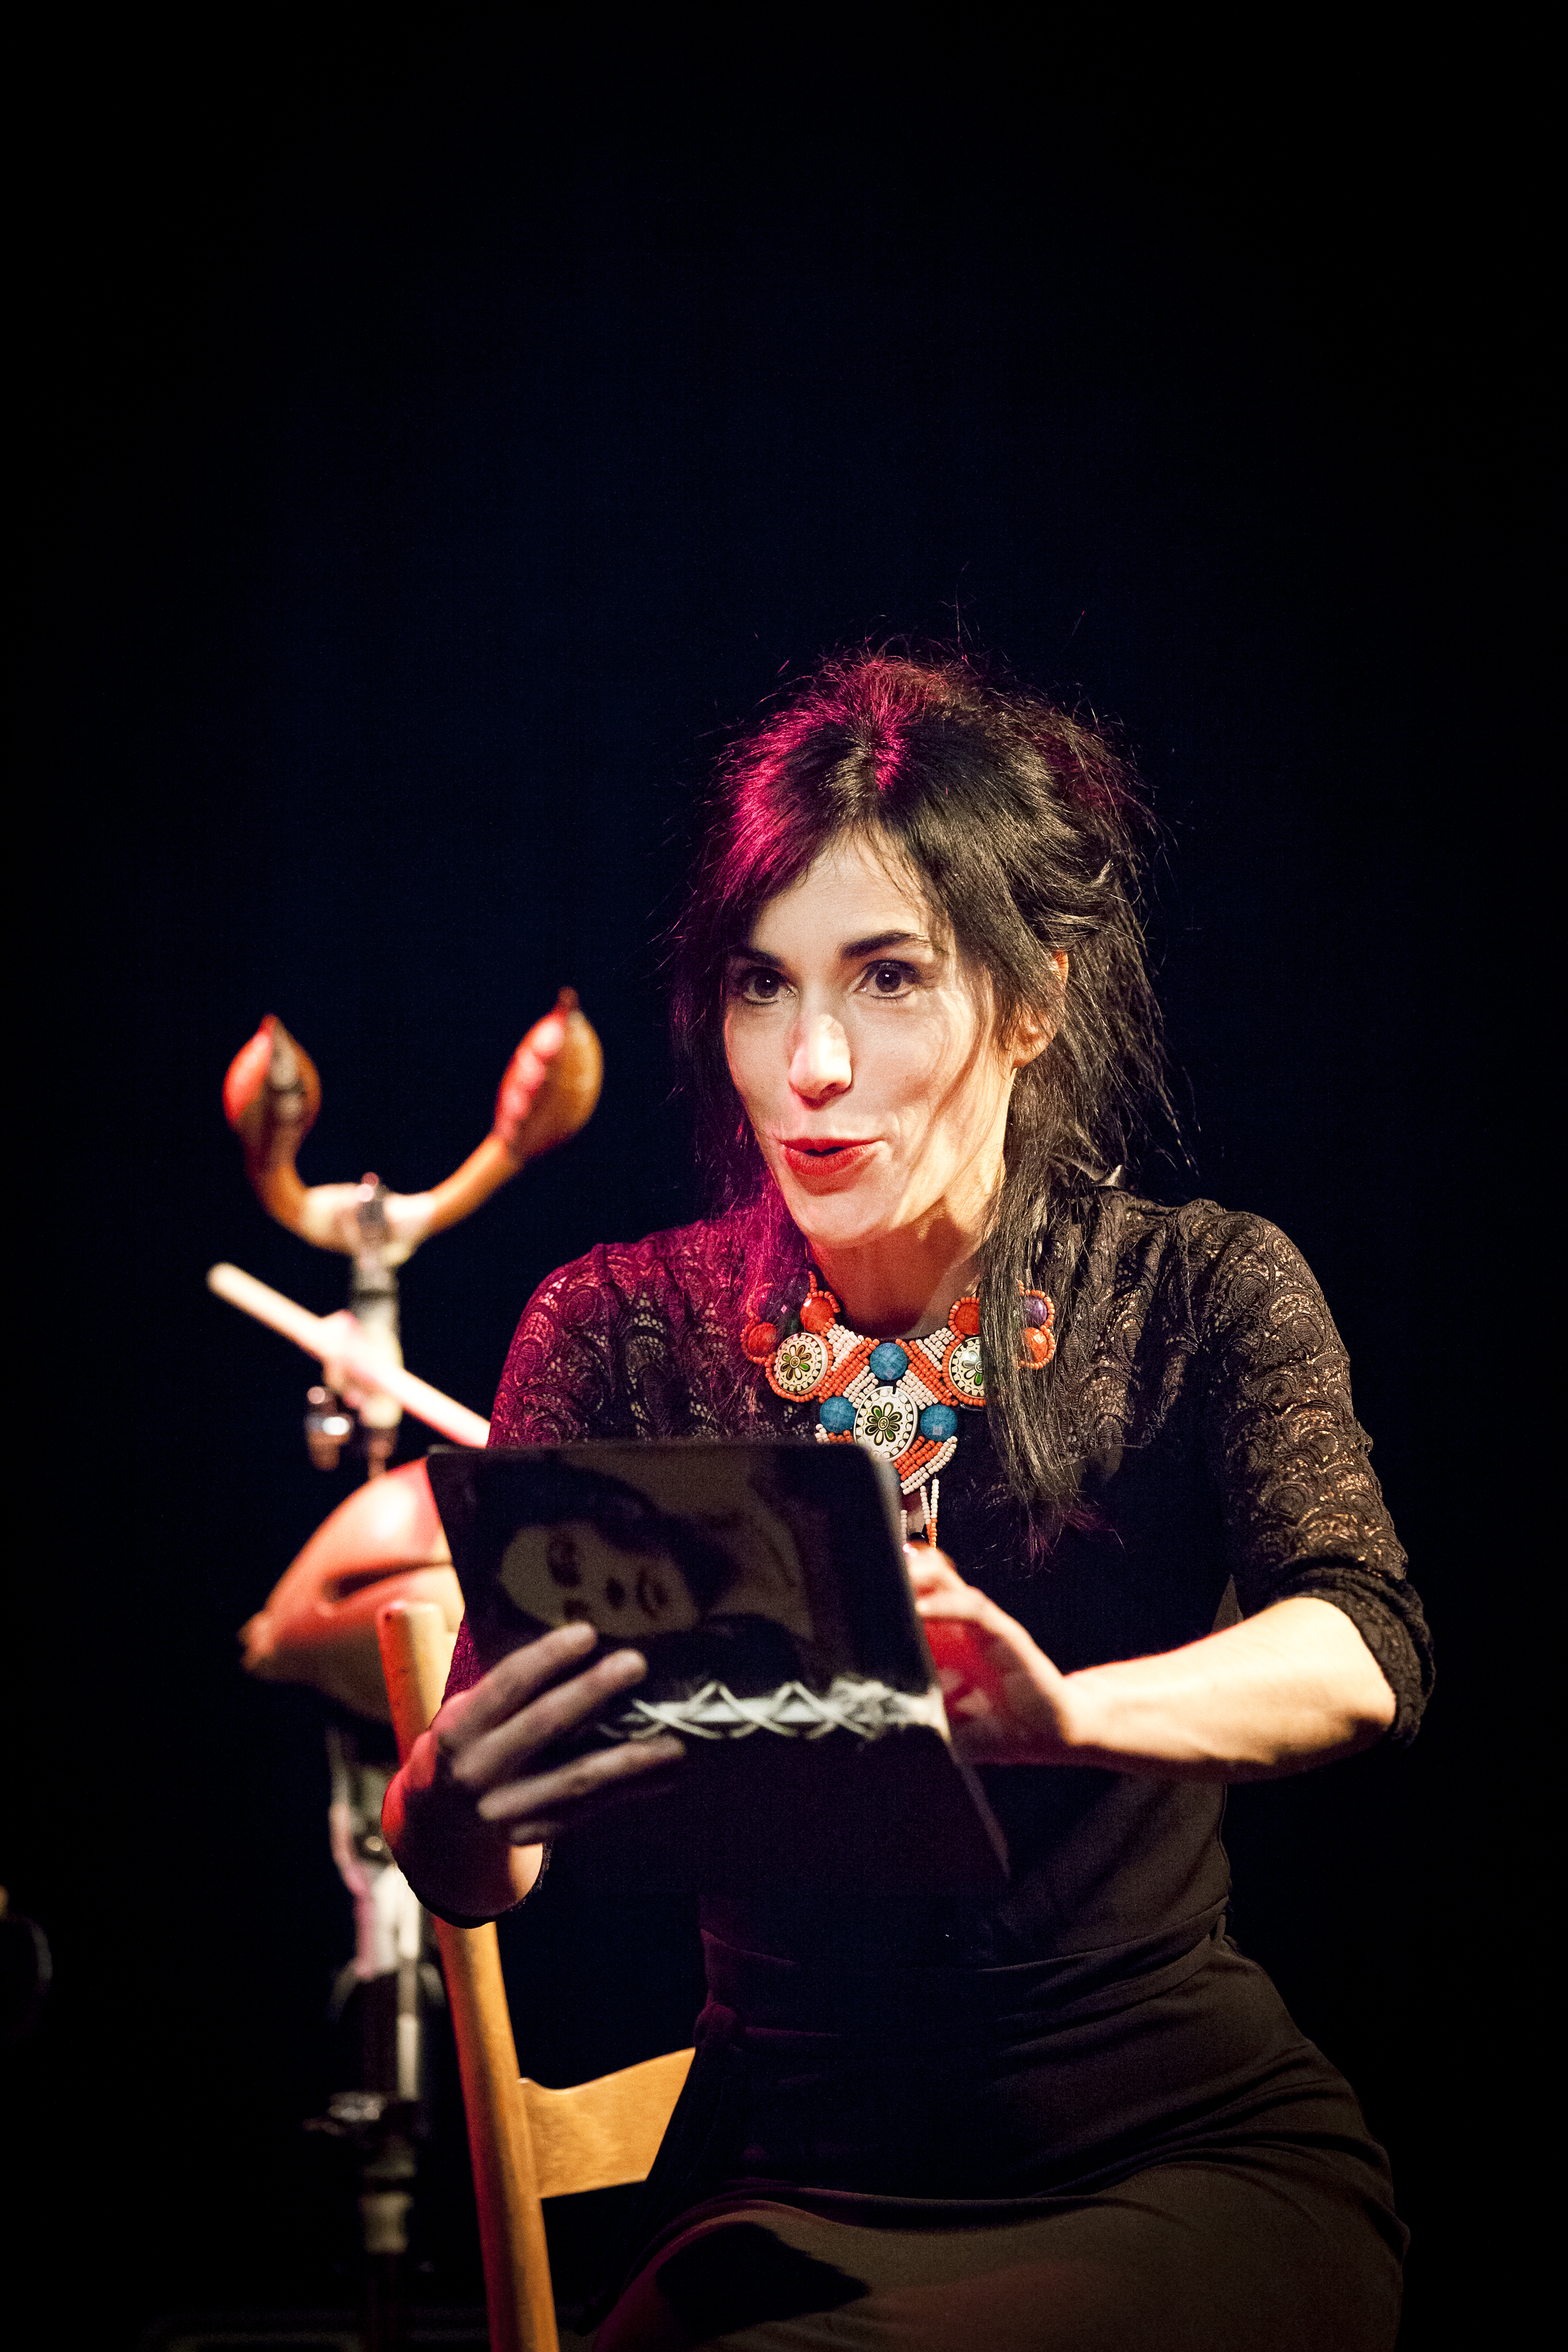 Martine Corbat